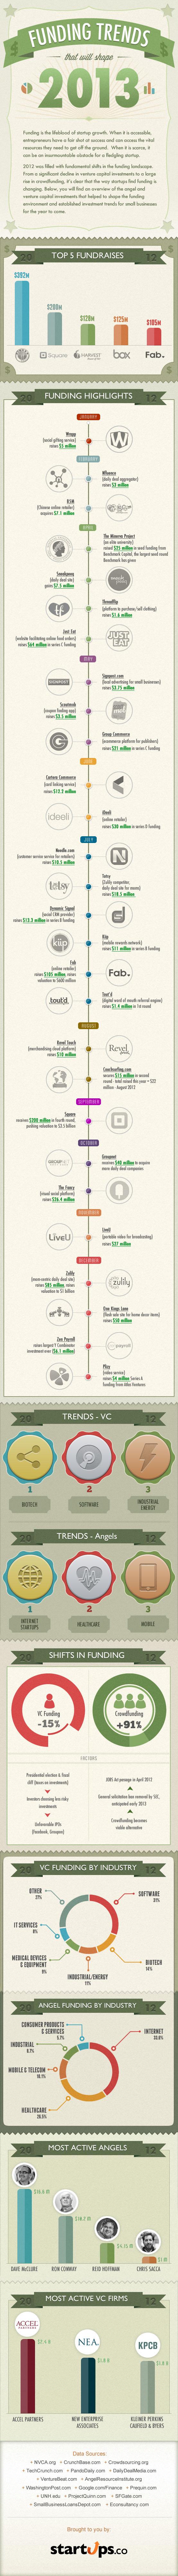 Venture-Capital-Trends